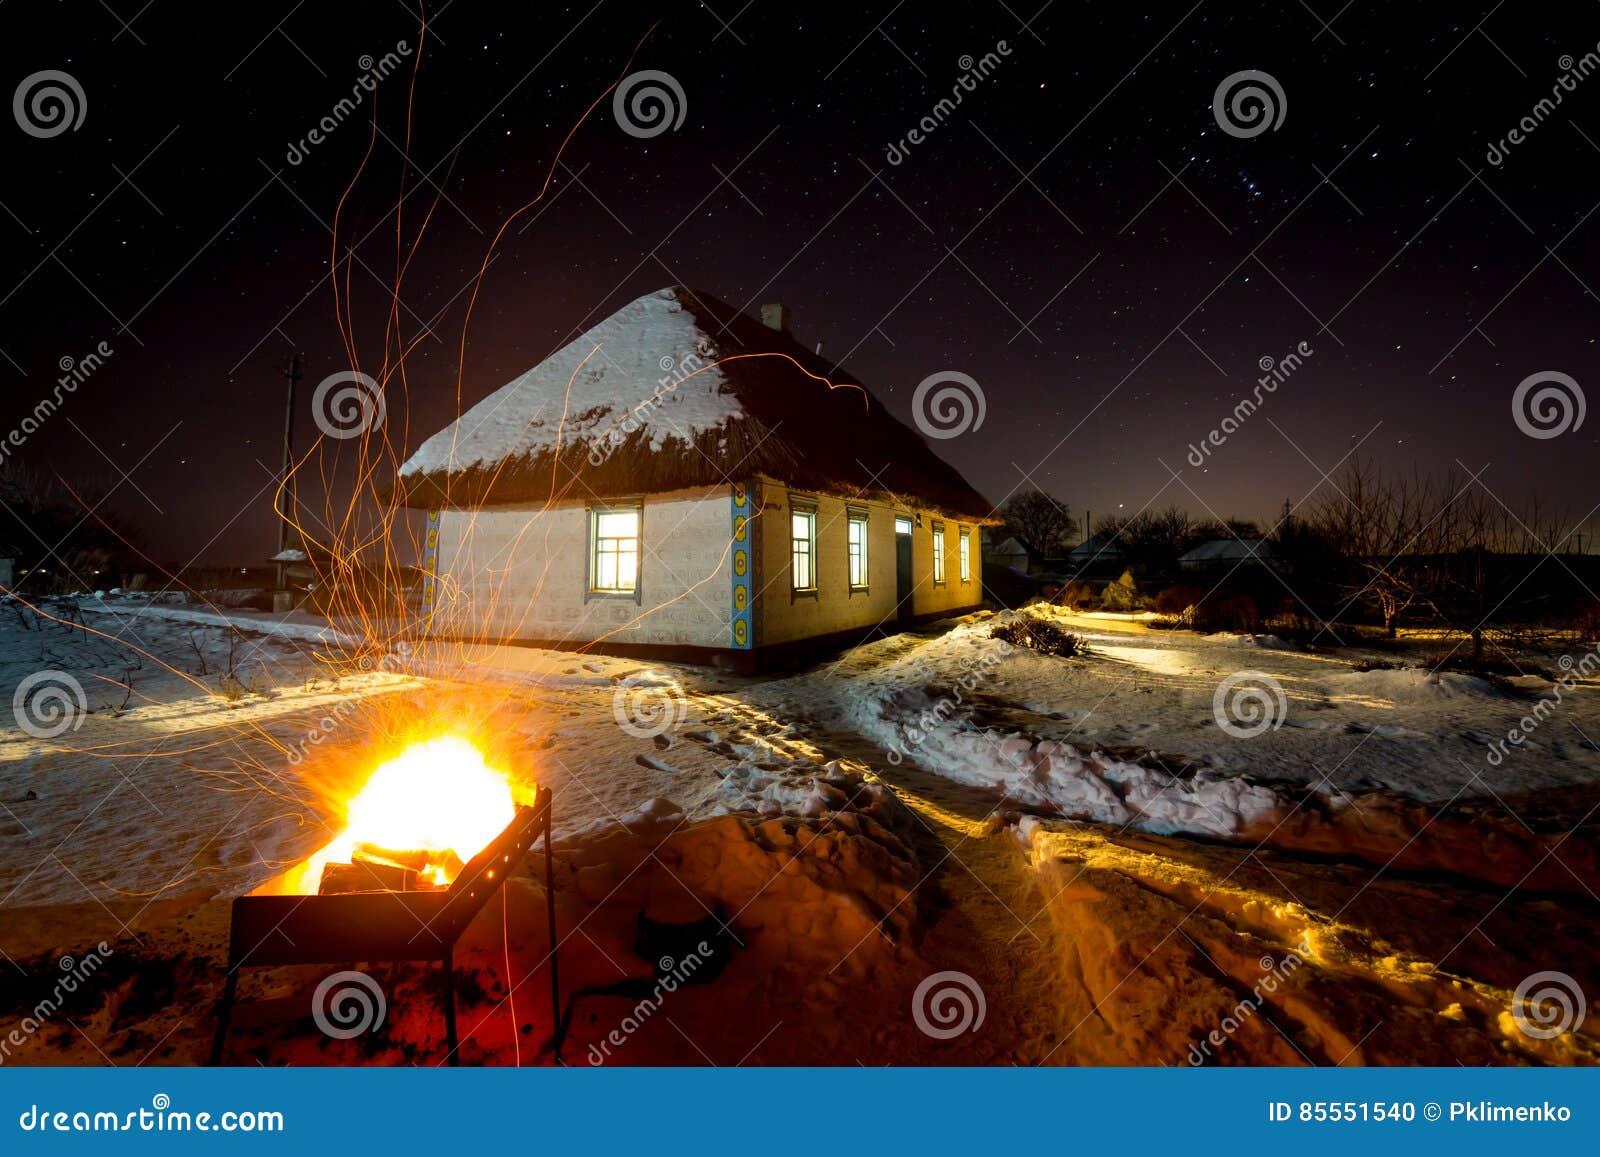 Heißes Grillfeuer auf altem Haus backgroud